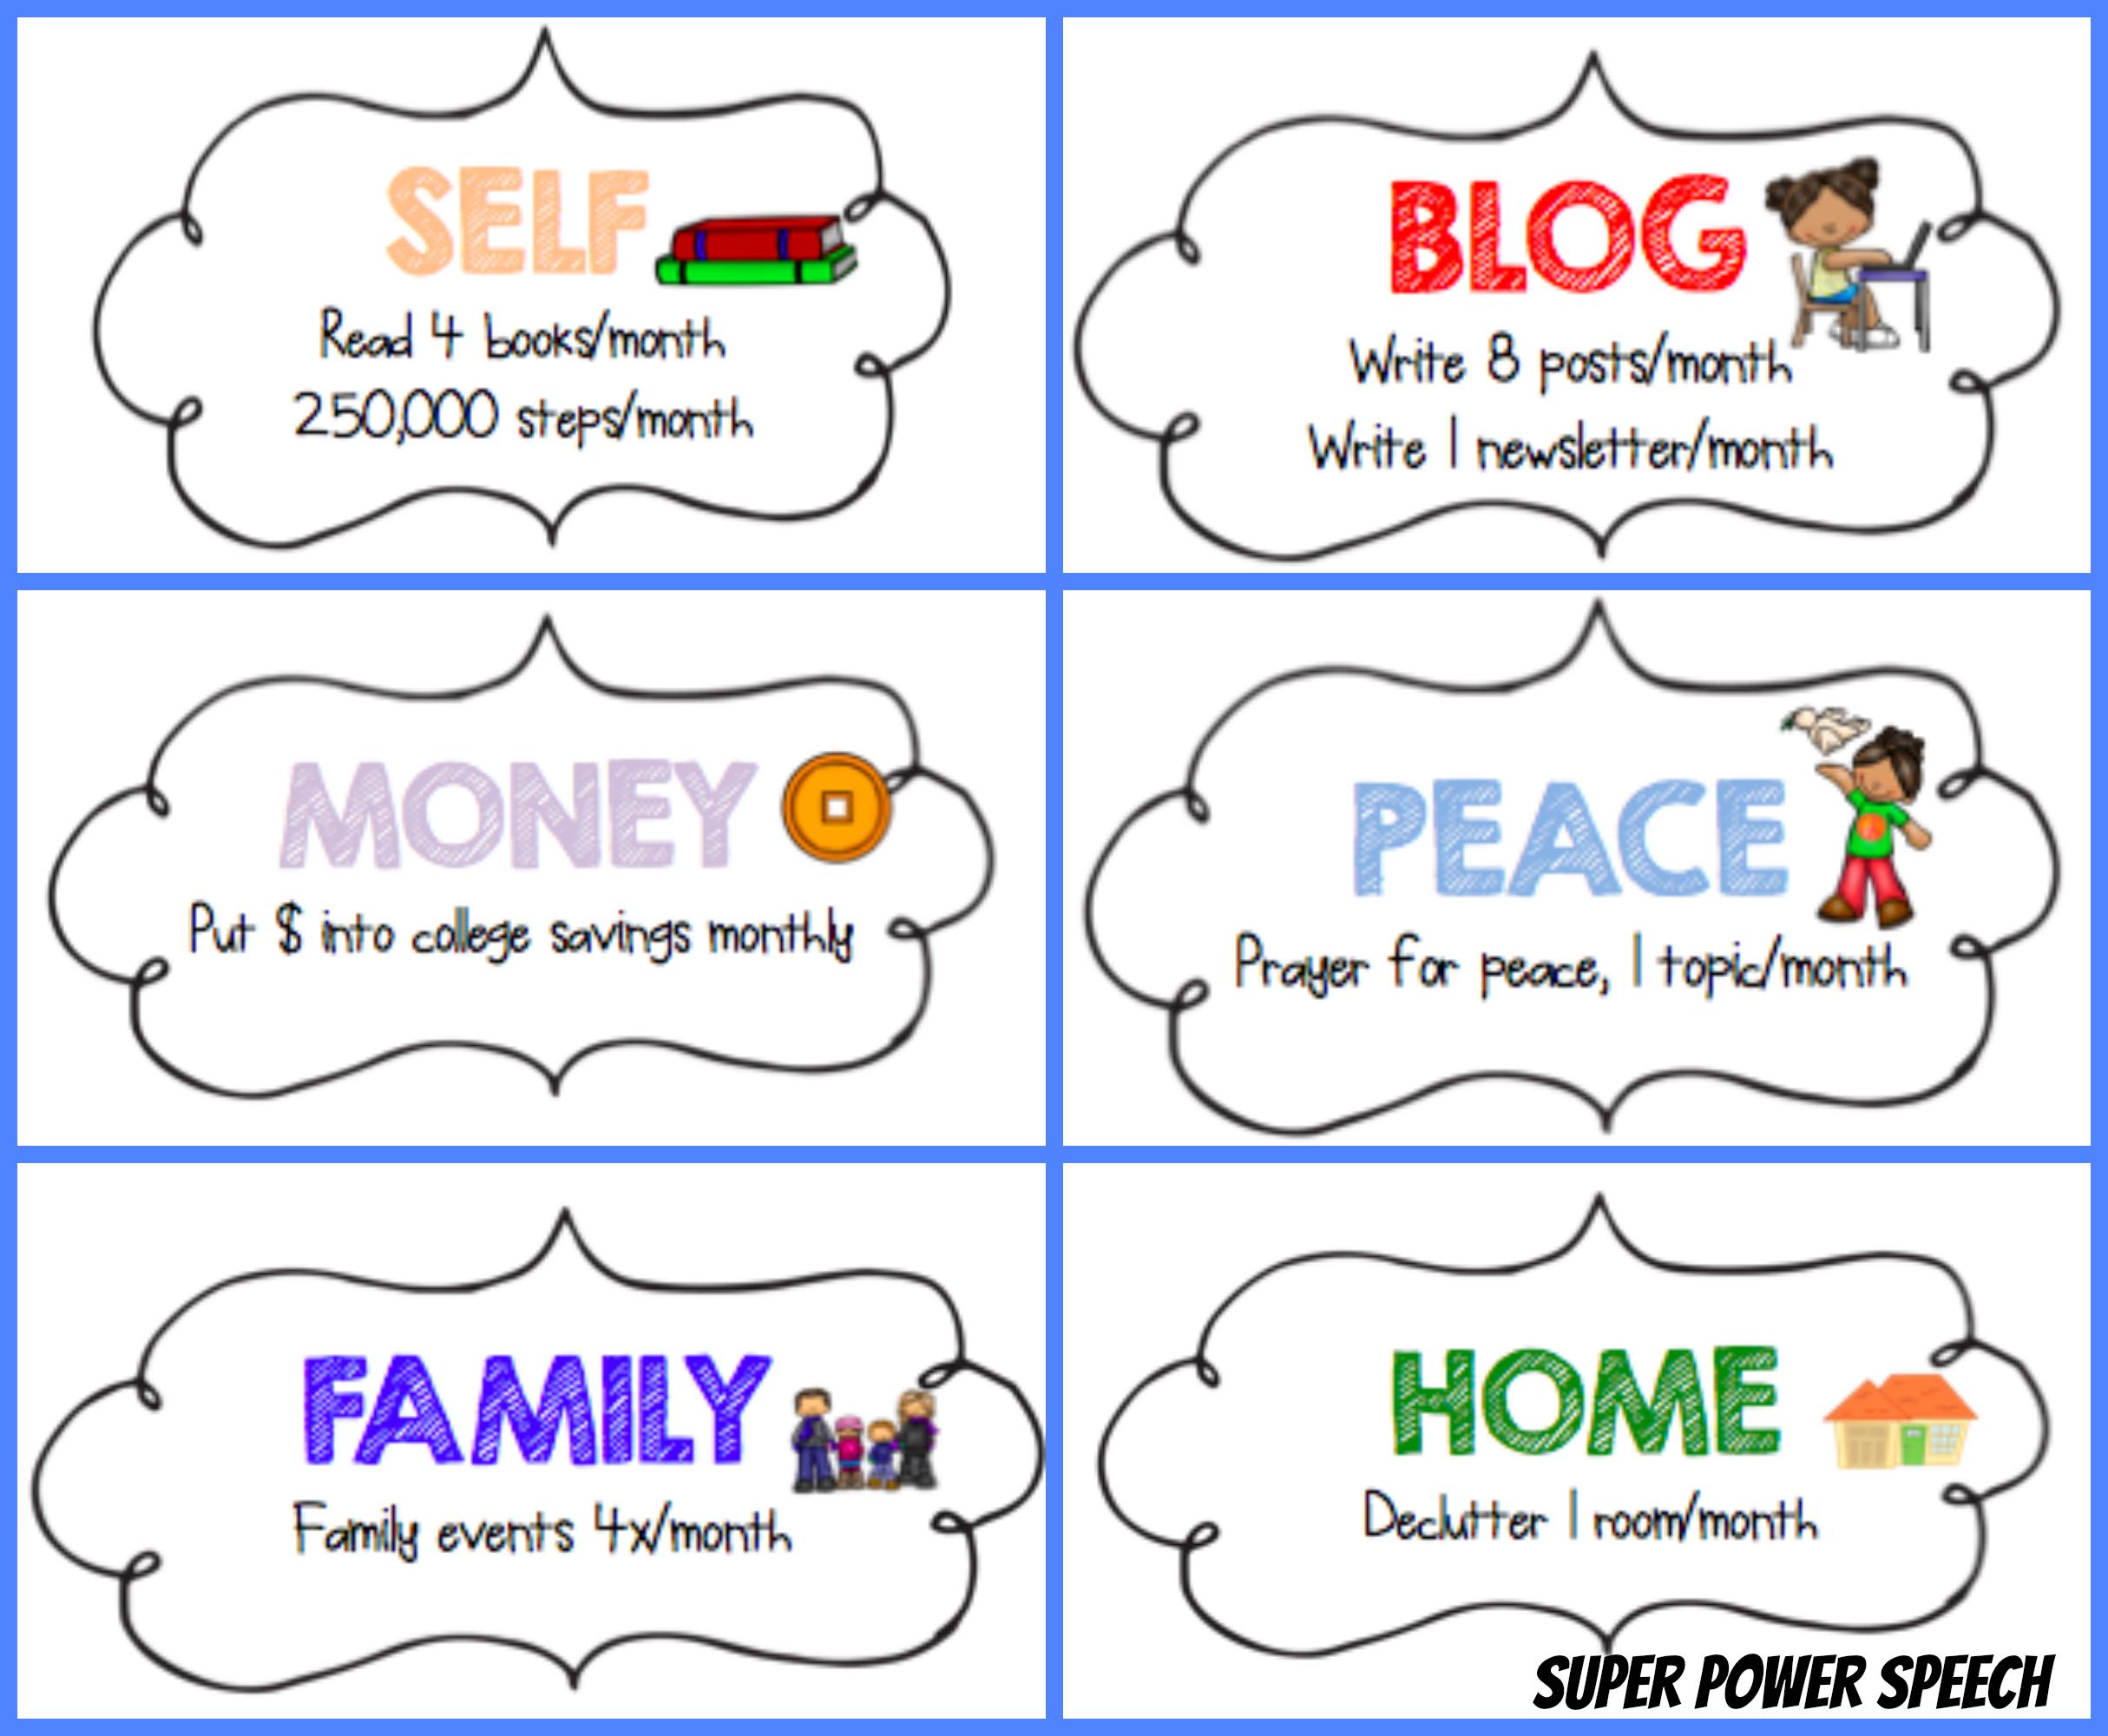 peace and goals super power speech 2015 peace and goals